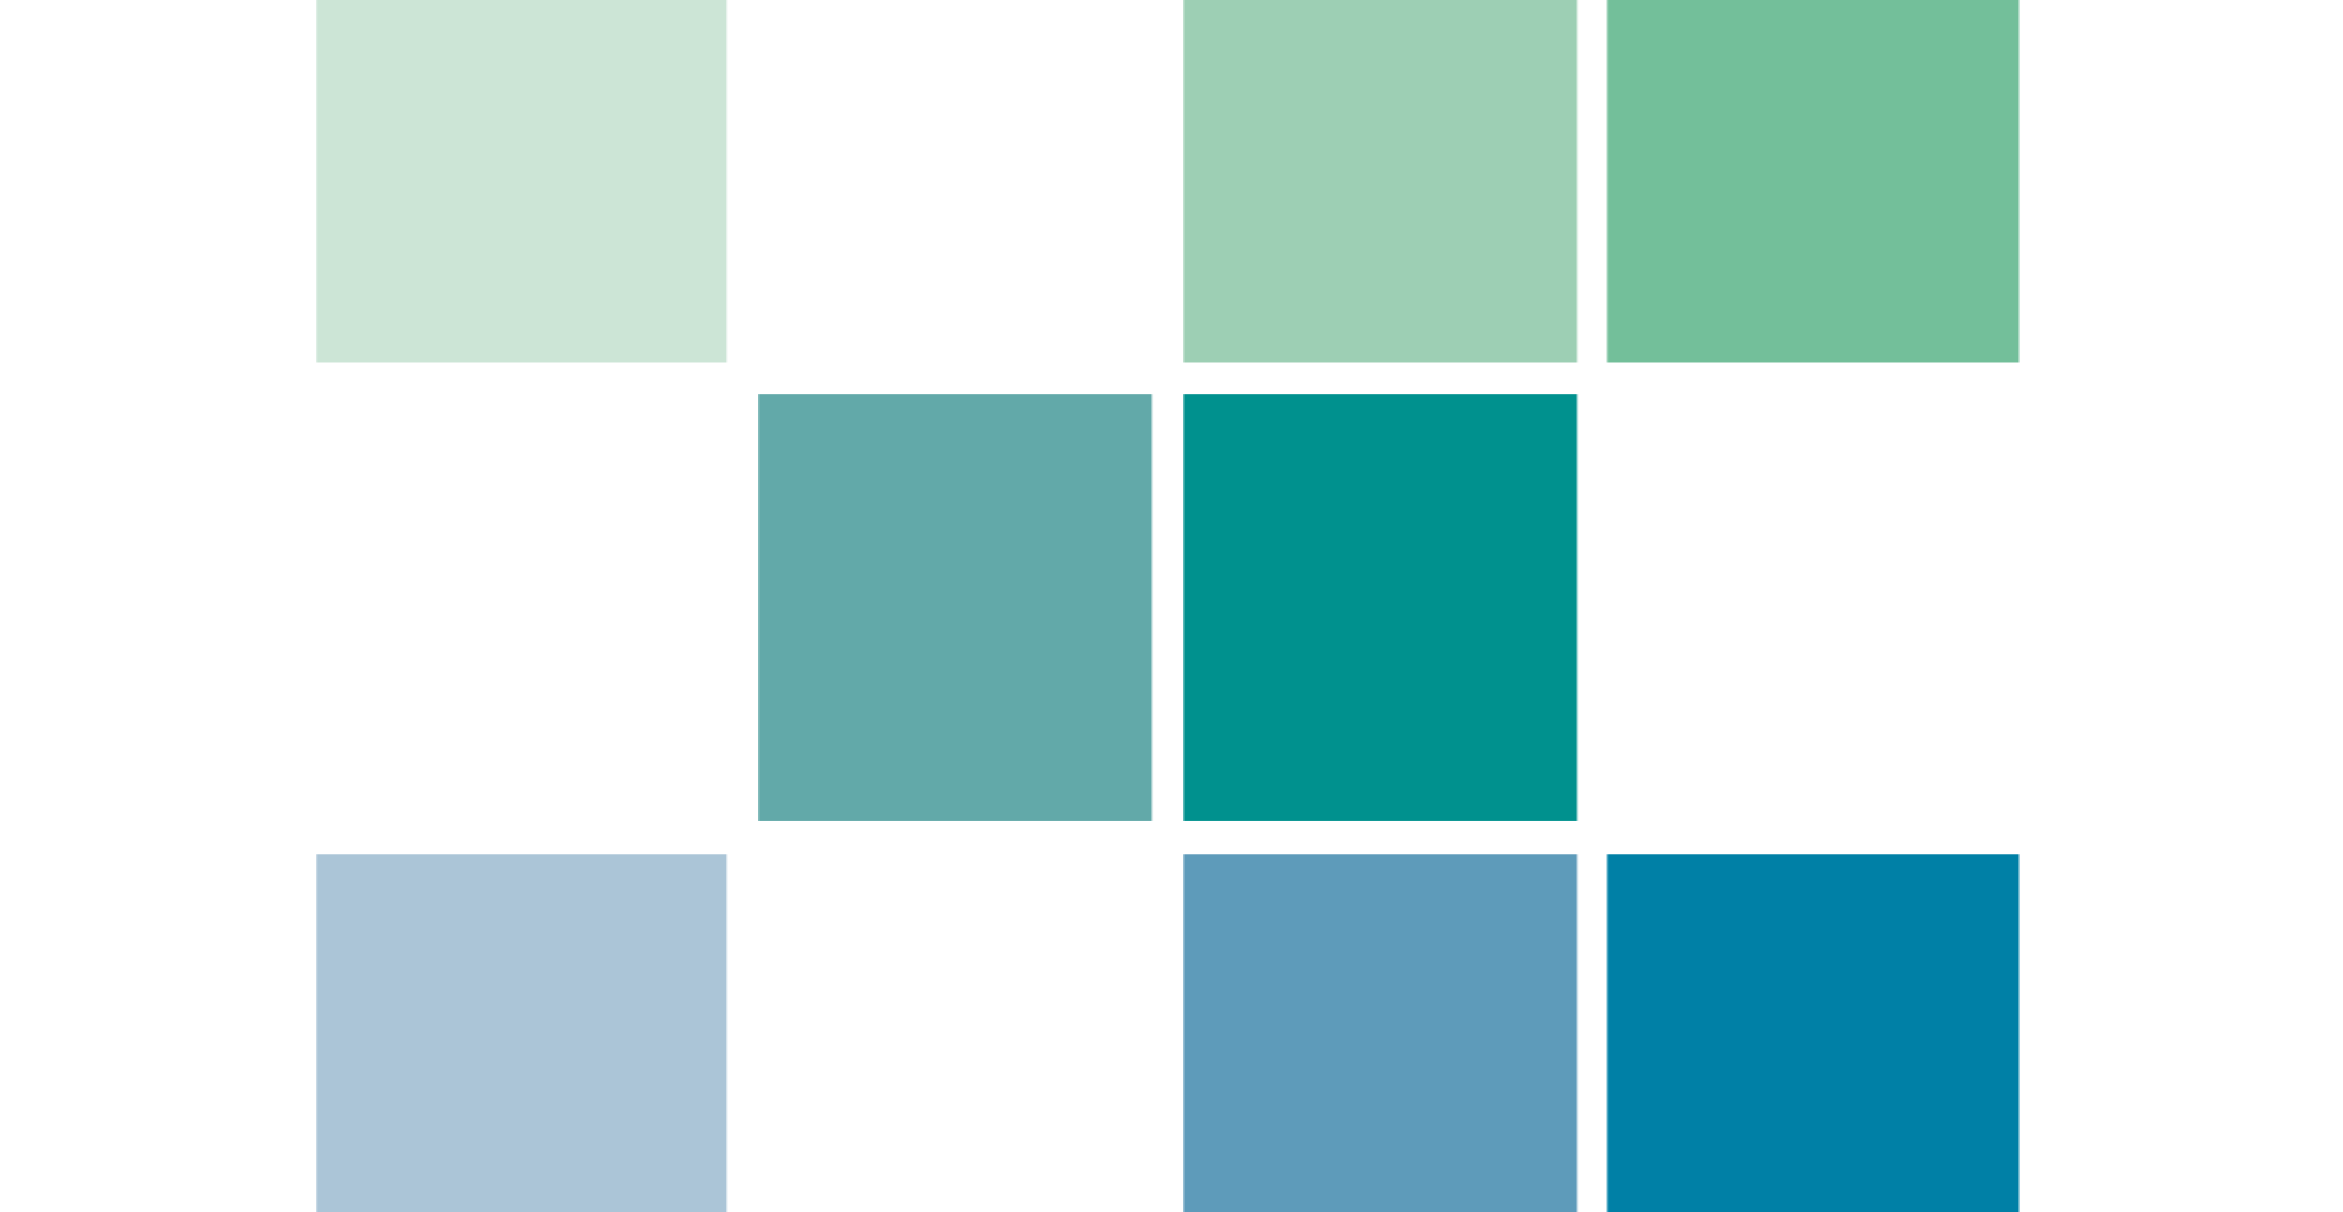 ALSC Annual Report Cover Squares